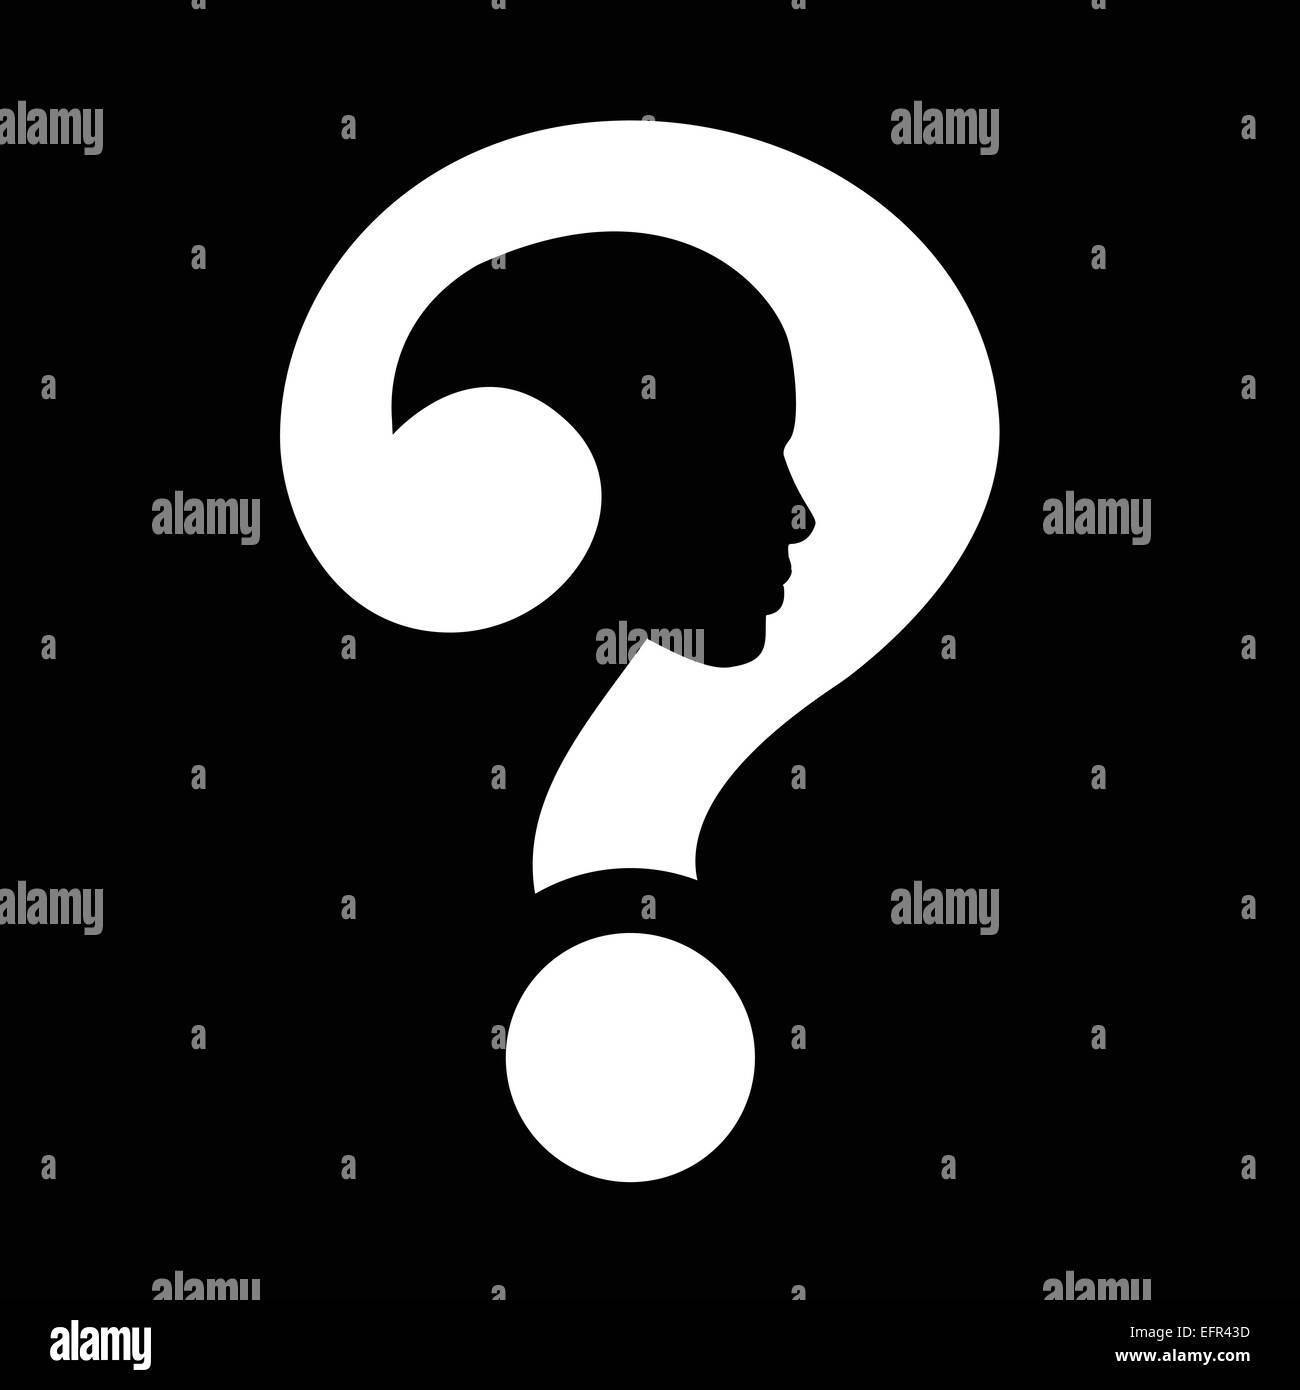 Question mark human head symbol - Stock Image